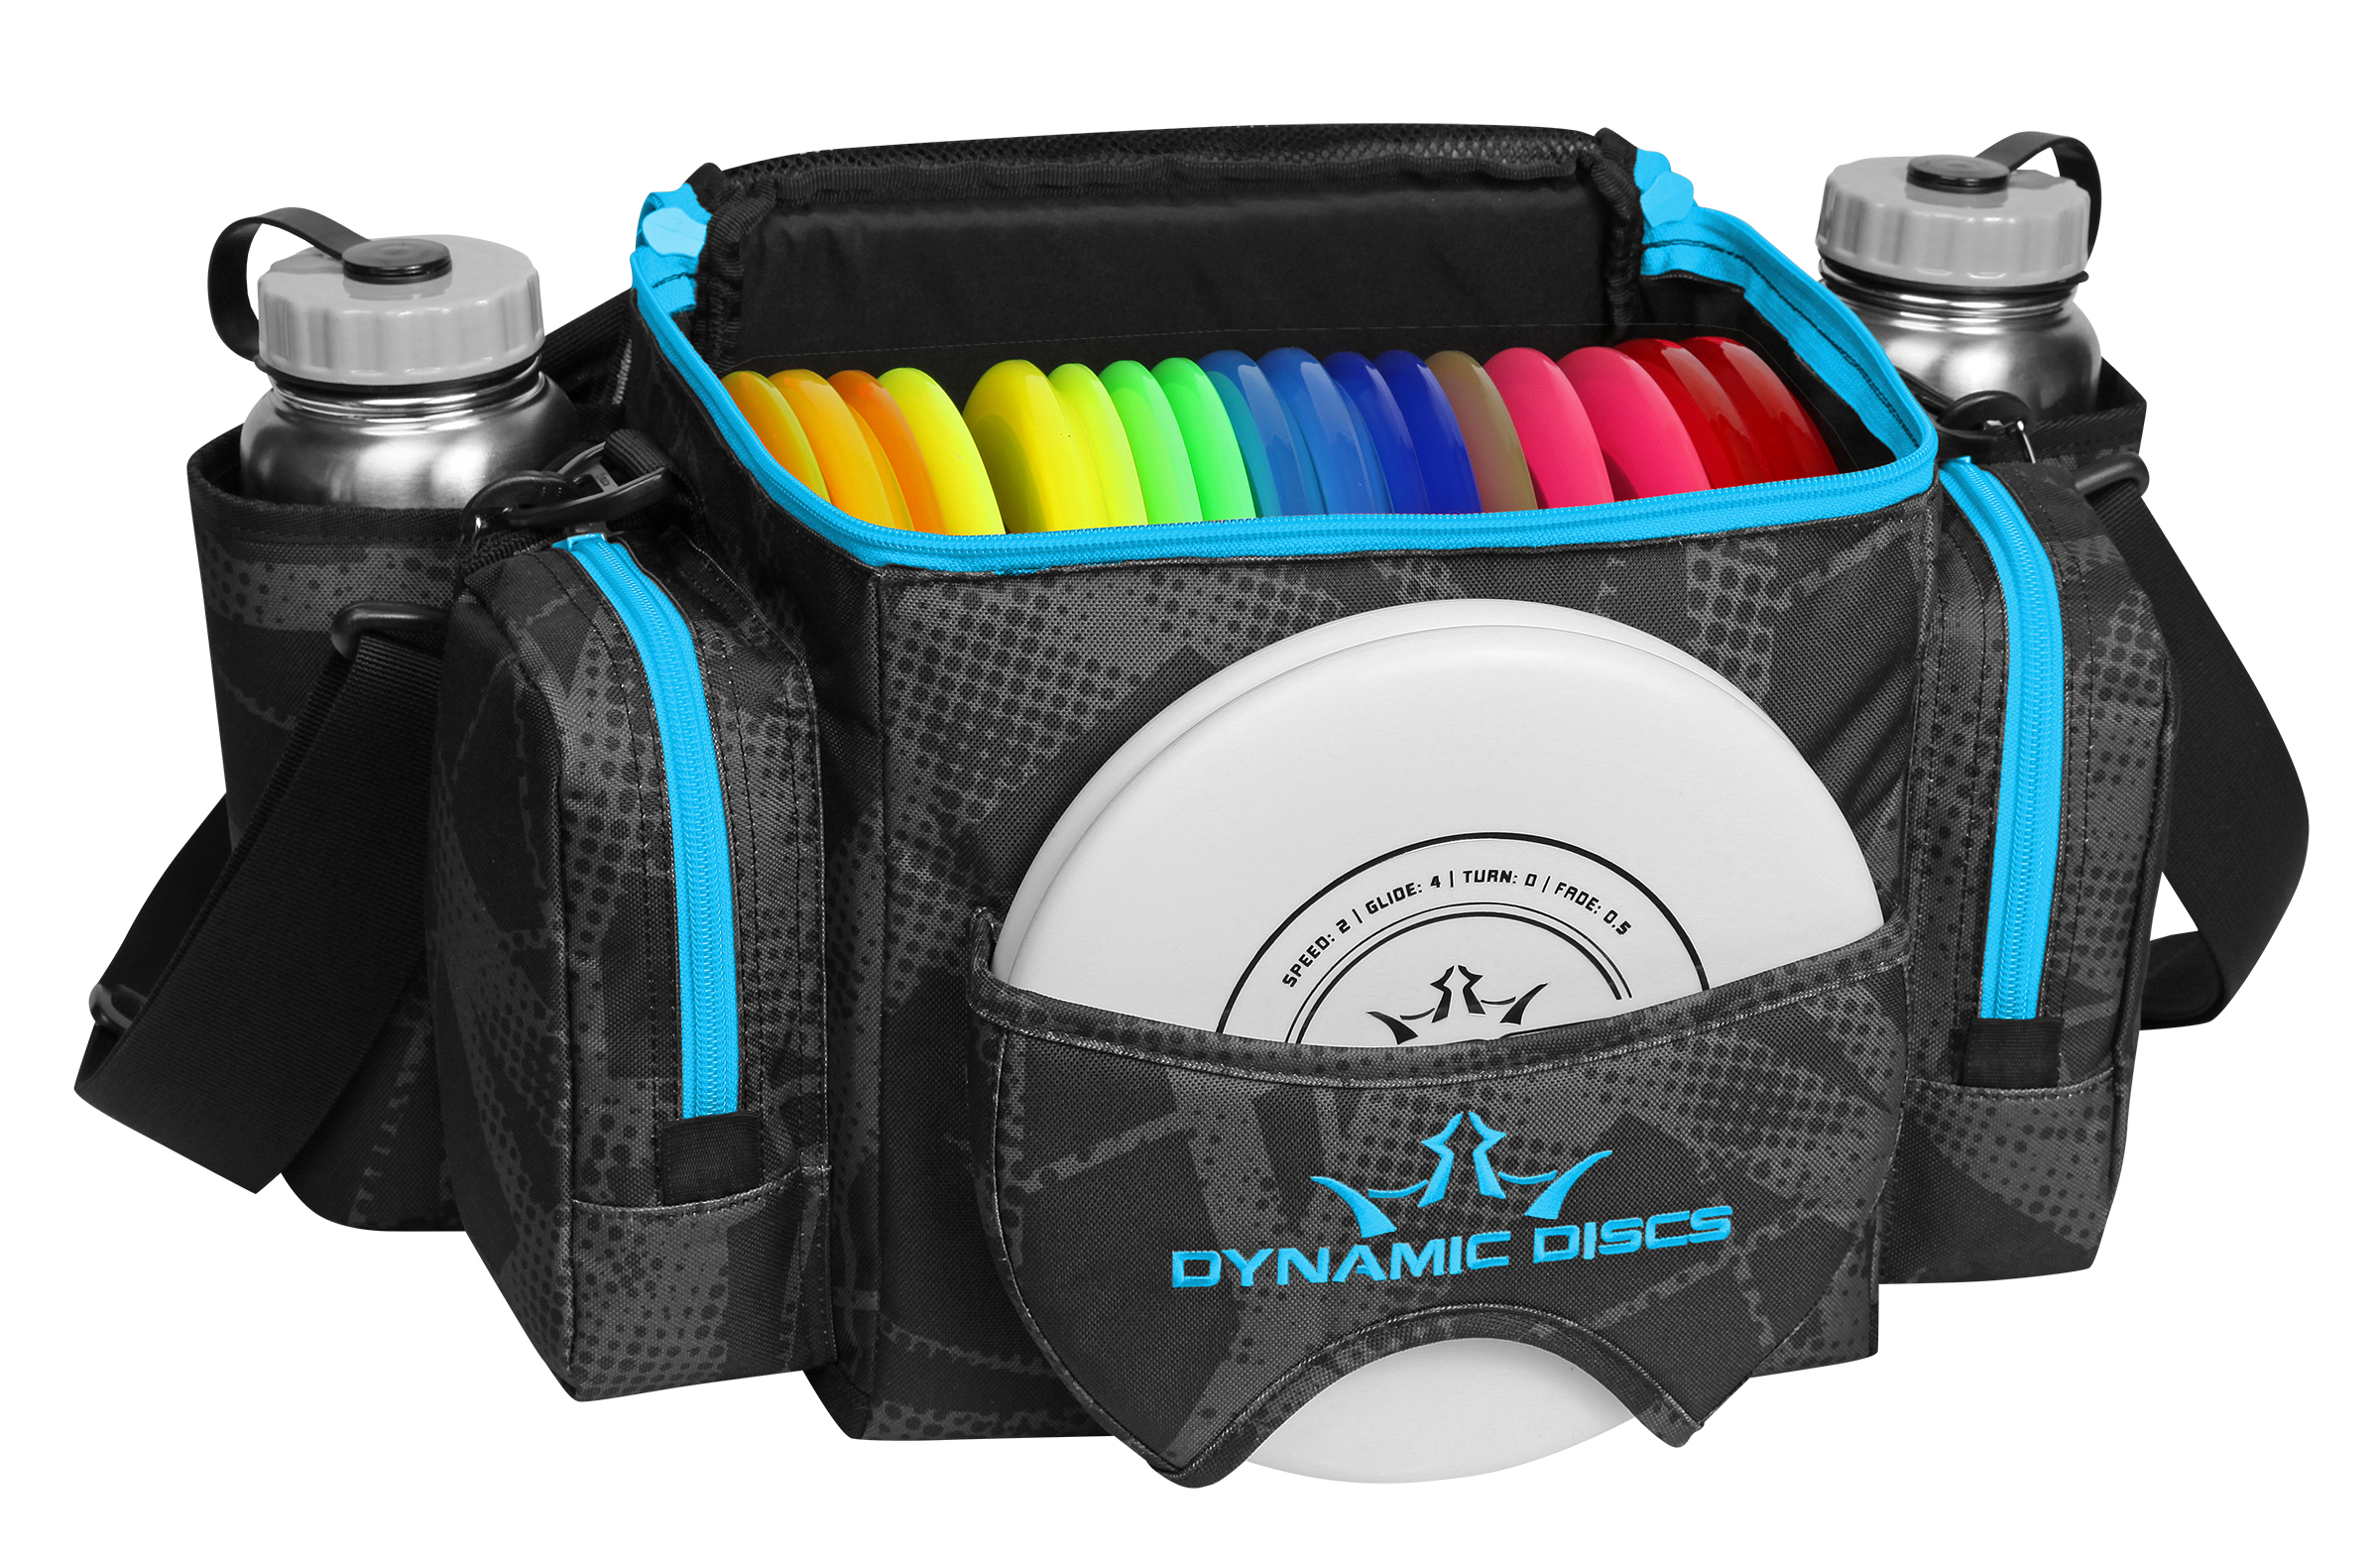 dynamic discs soldier bag 18 20 soldier bag bags